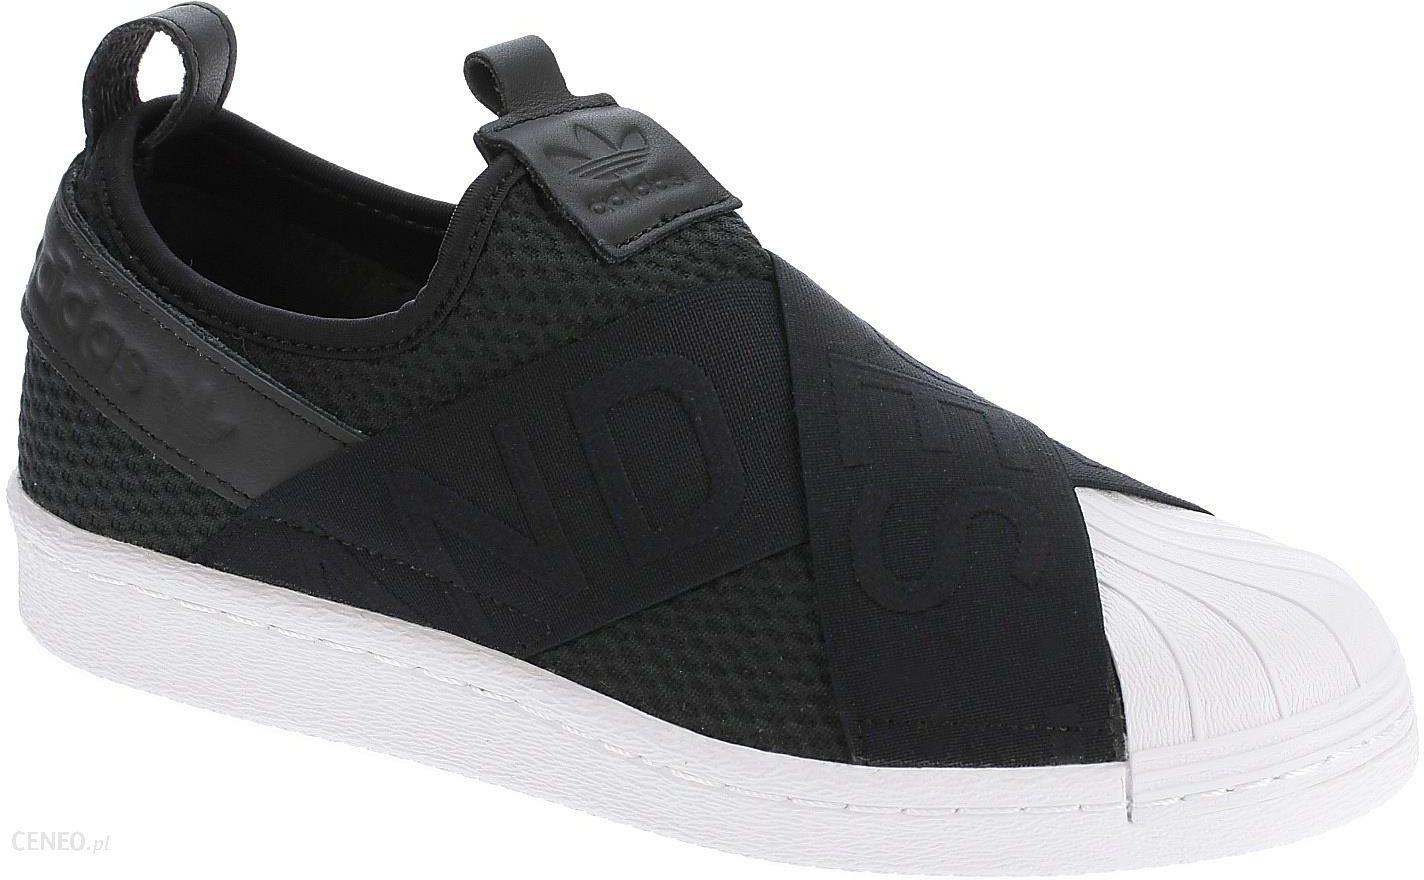 Buty adidas Originals Superstar Slip On Core BlackCore BlackWhite 40 23 Ceny i opinie Ceneo.pl